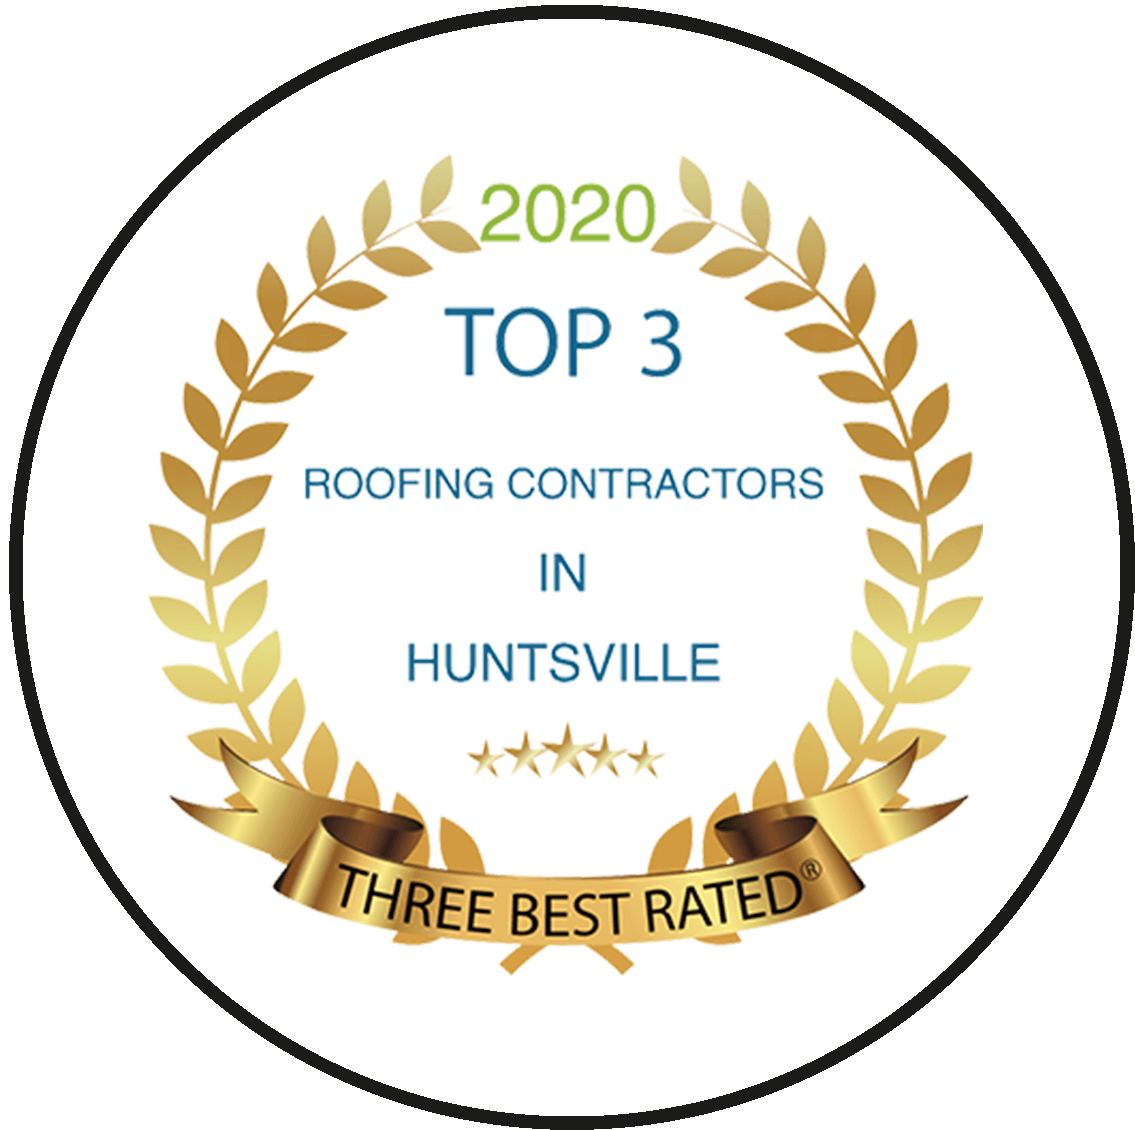 Top3 in hunstville 2020 award